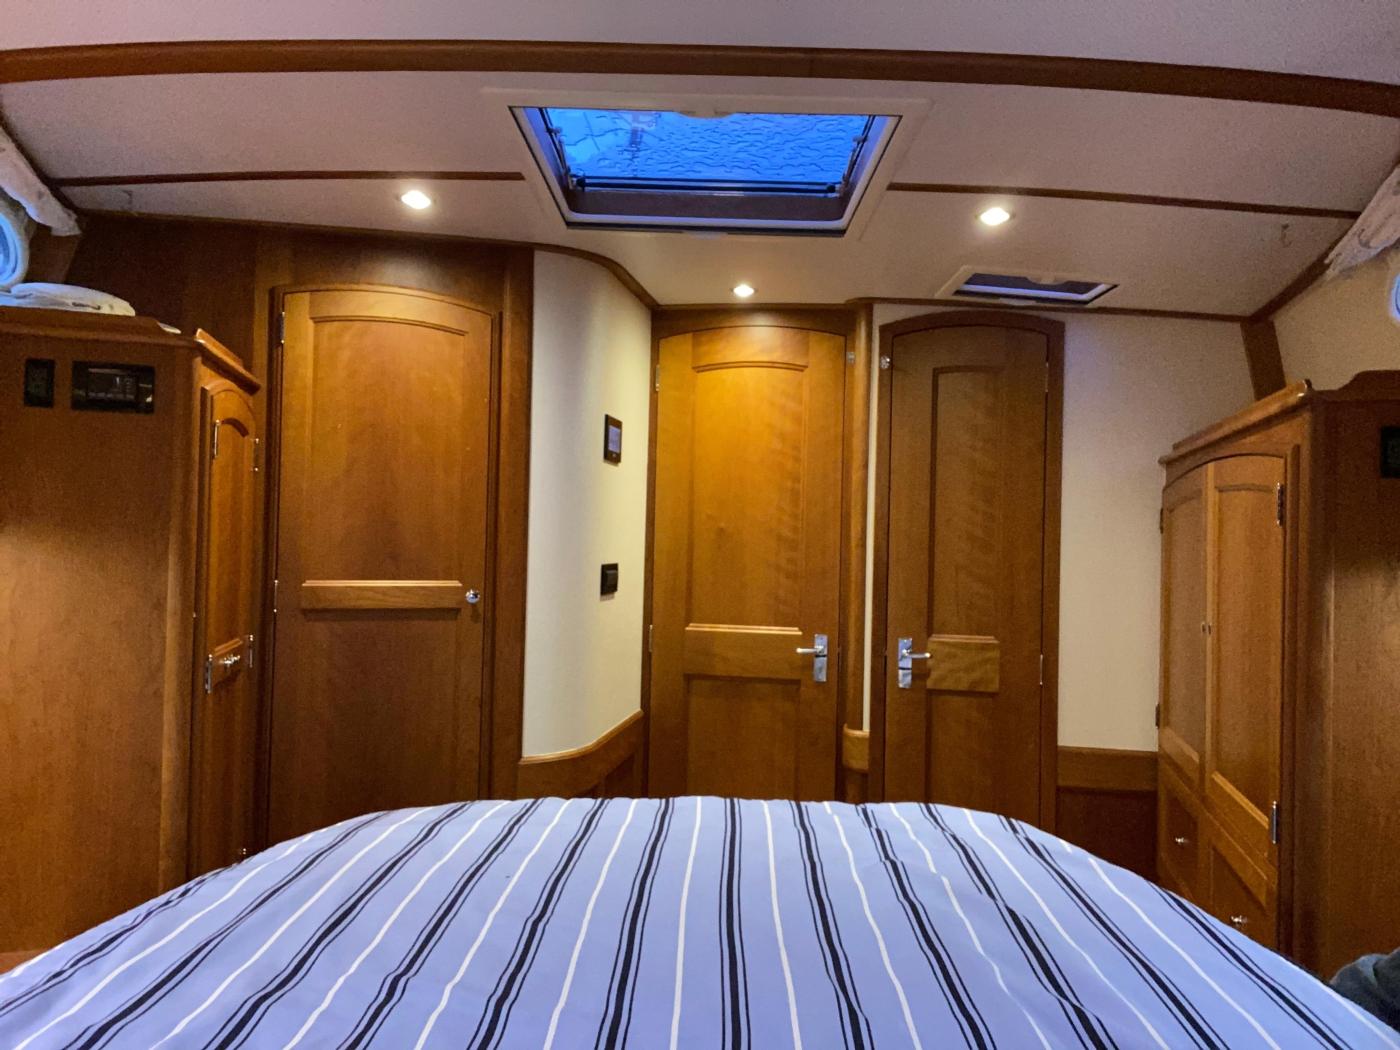 2018 Hinckley Talaria 48 MKII, Master cabin aft